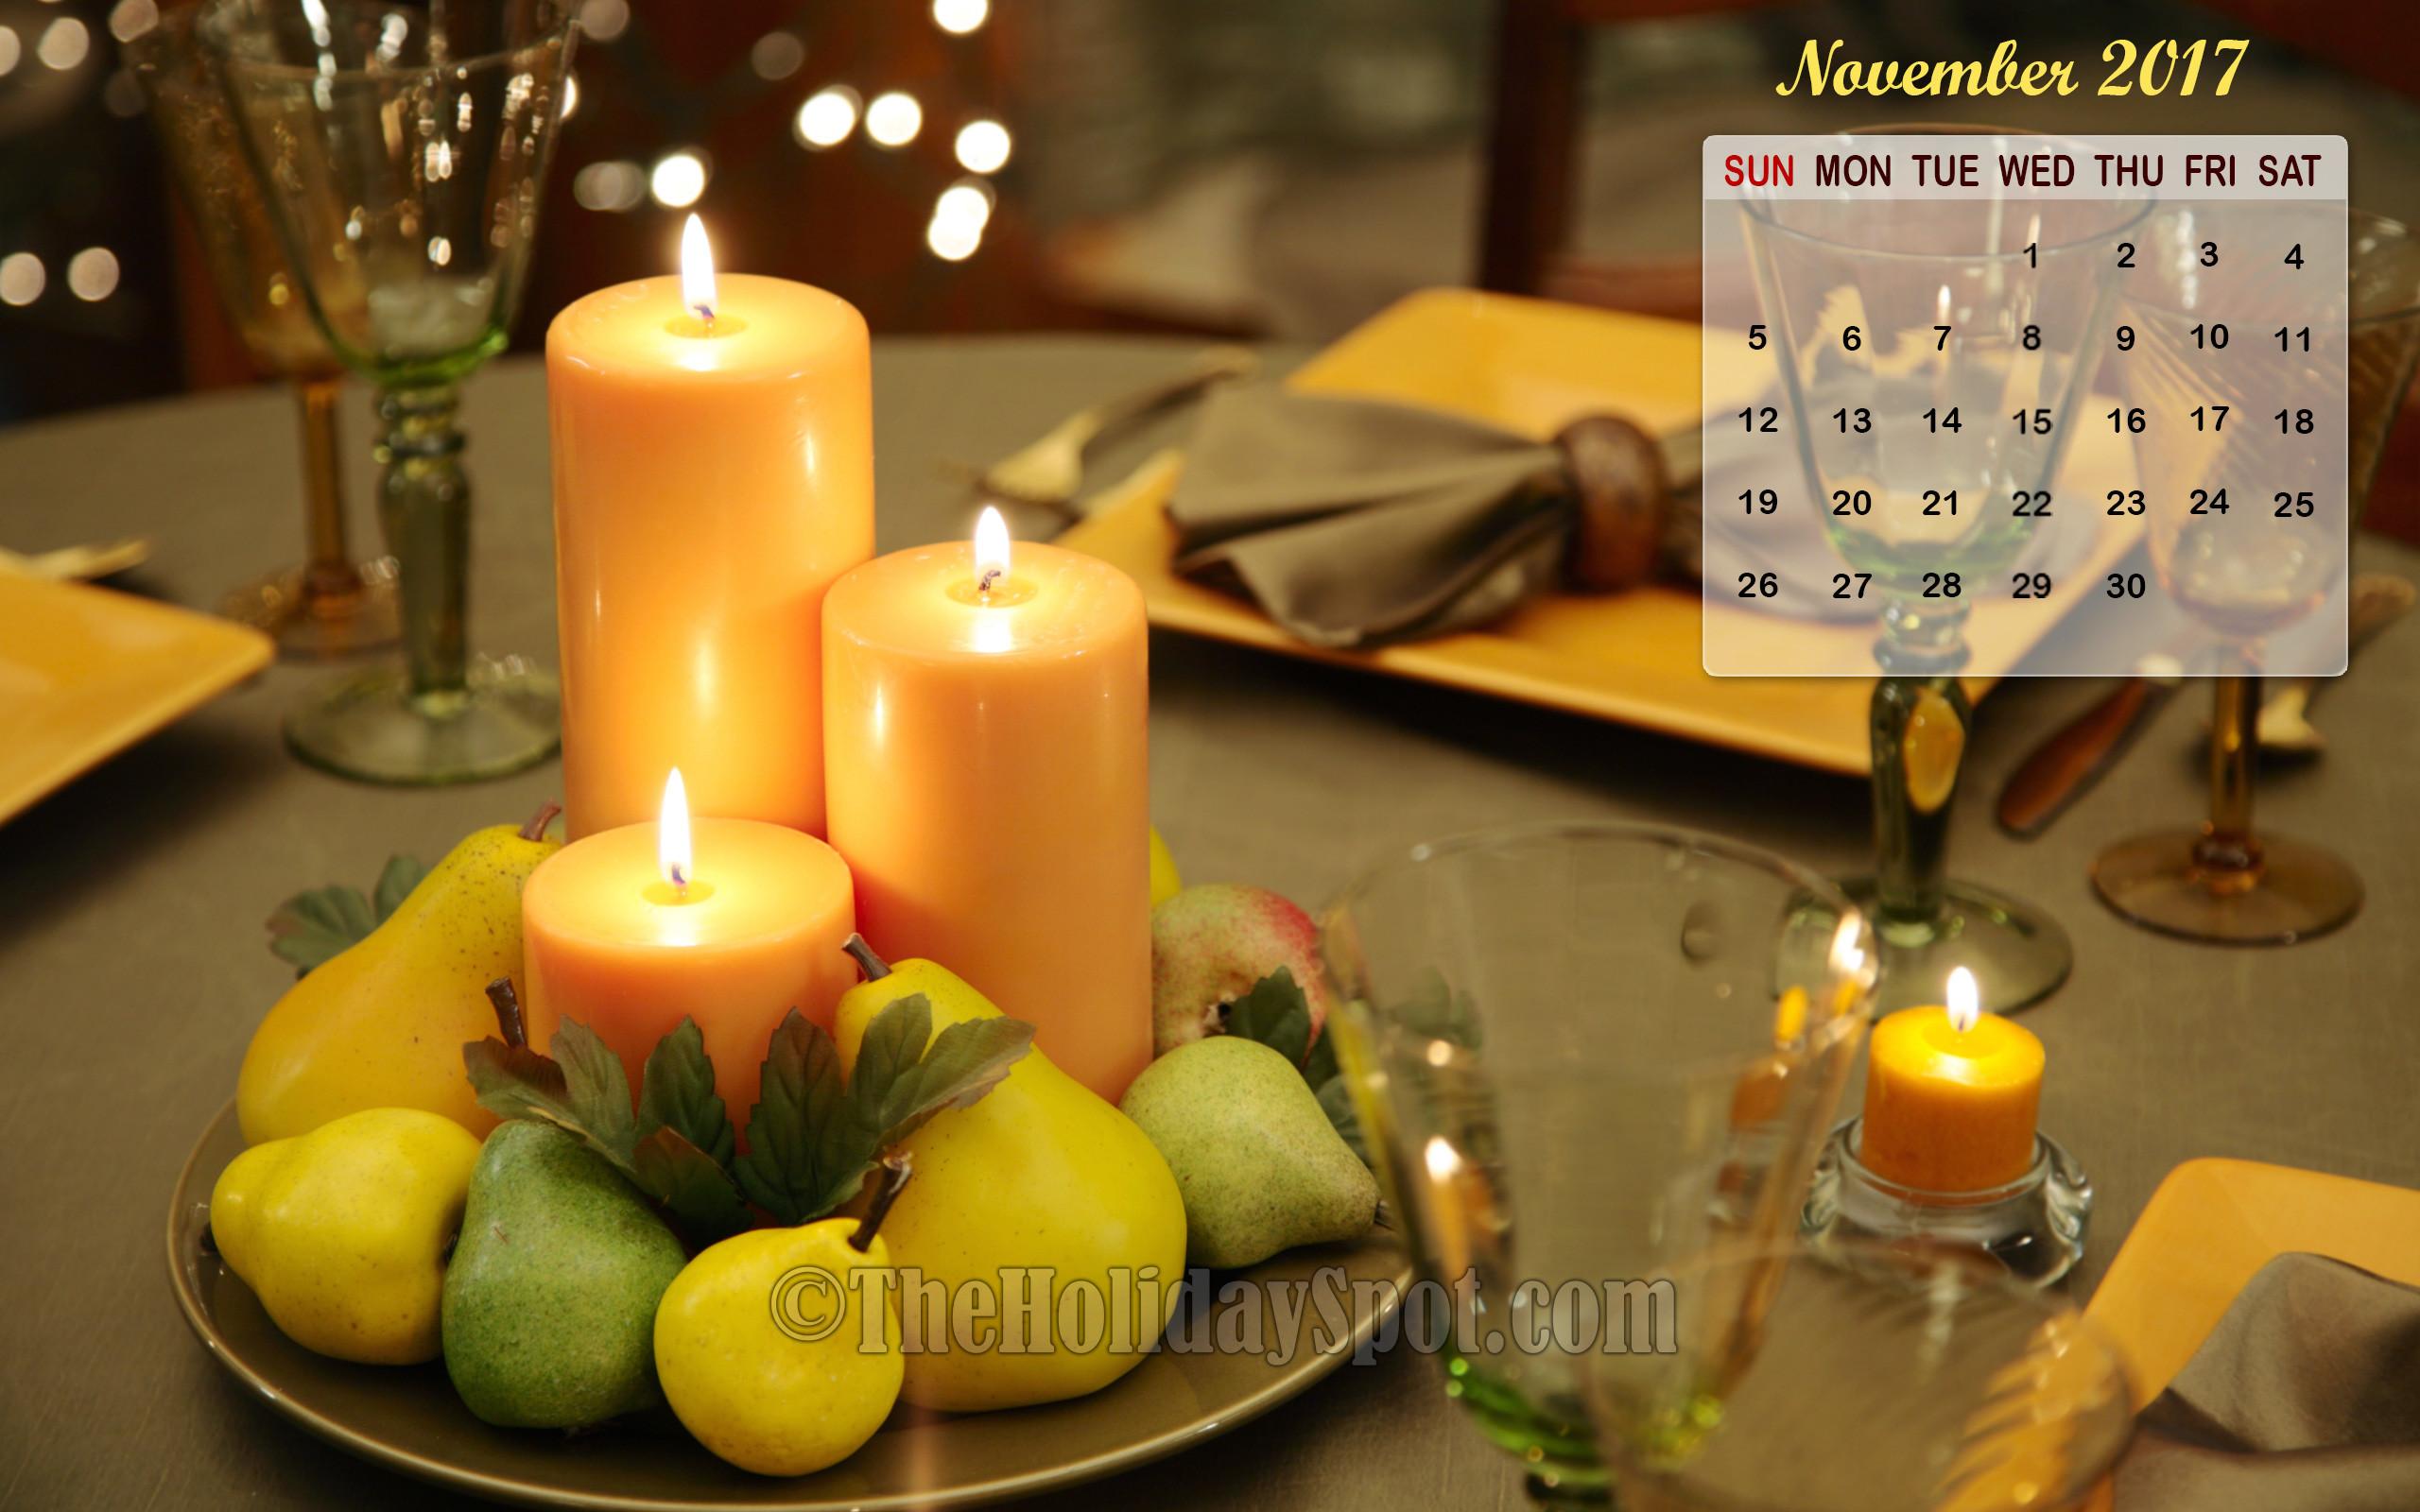 Thanksgiving themed November 2017 Calendar Wallpaper